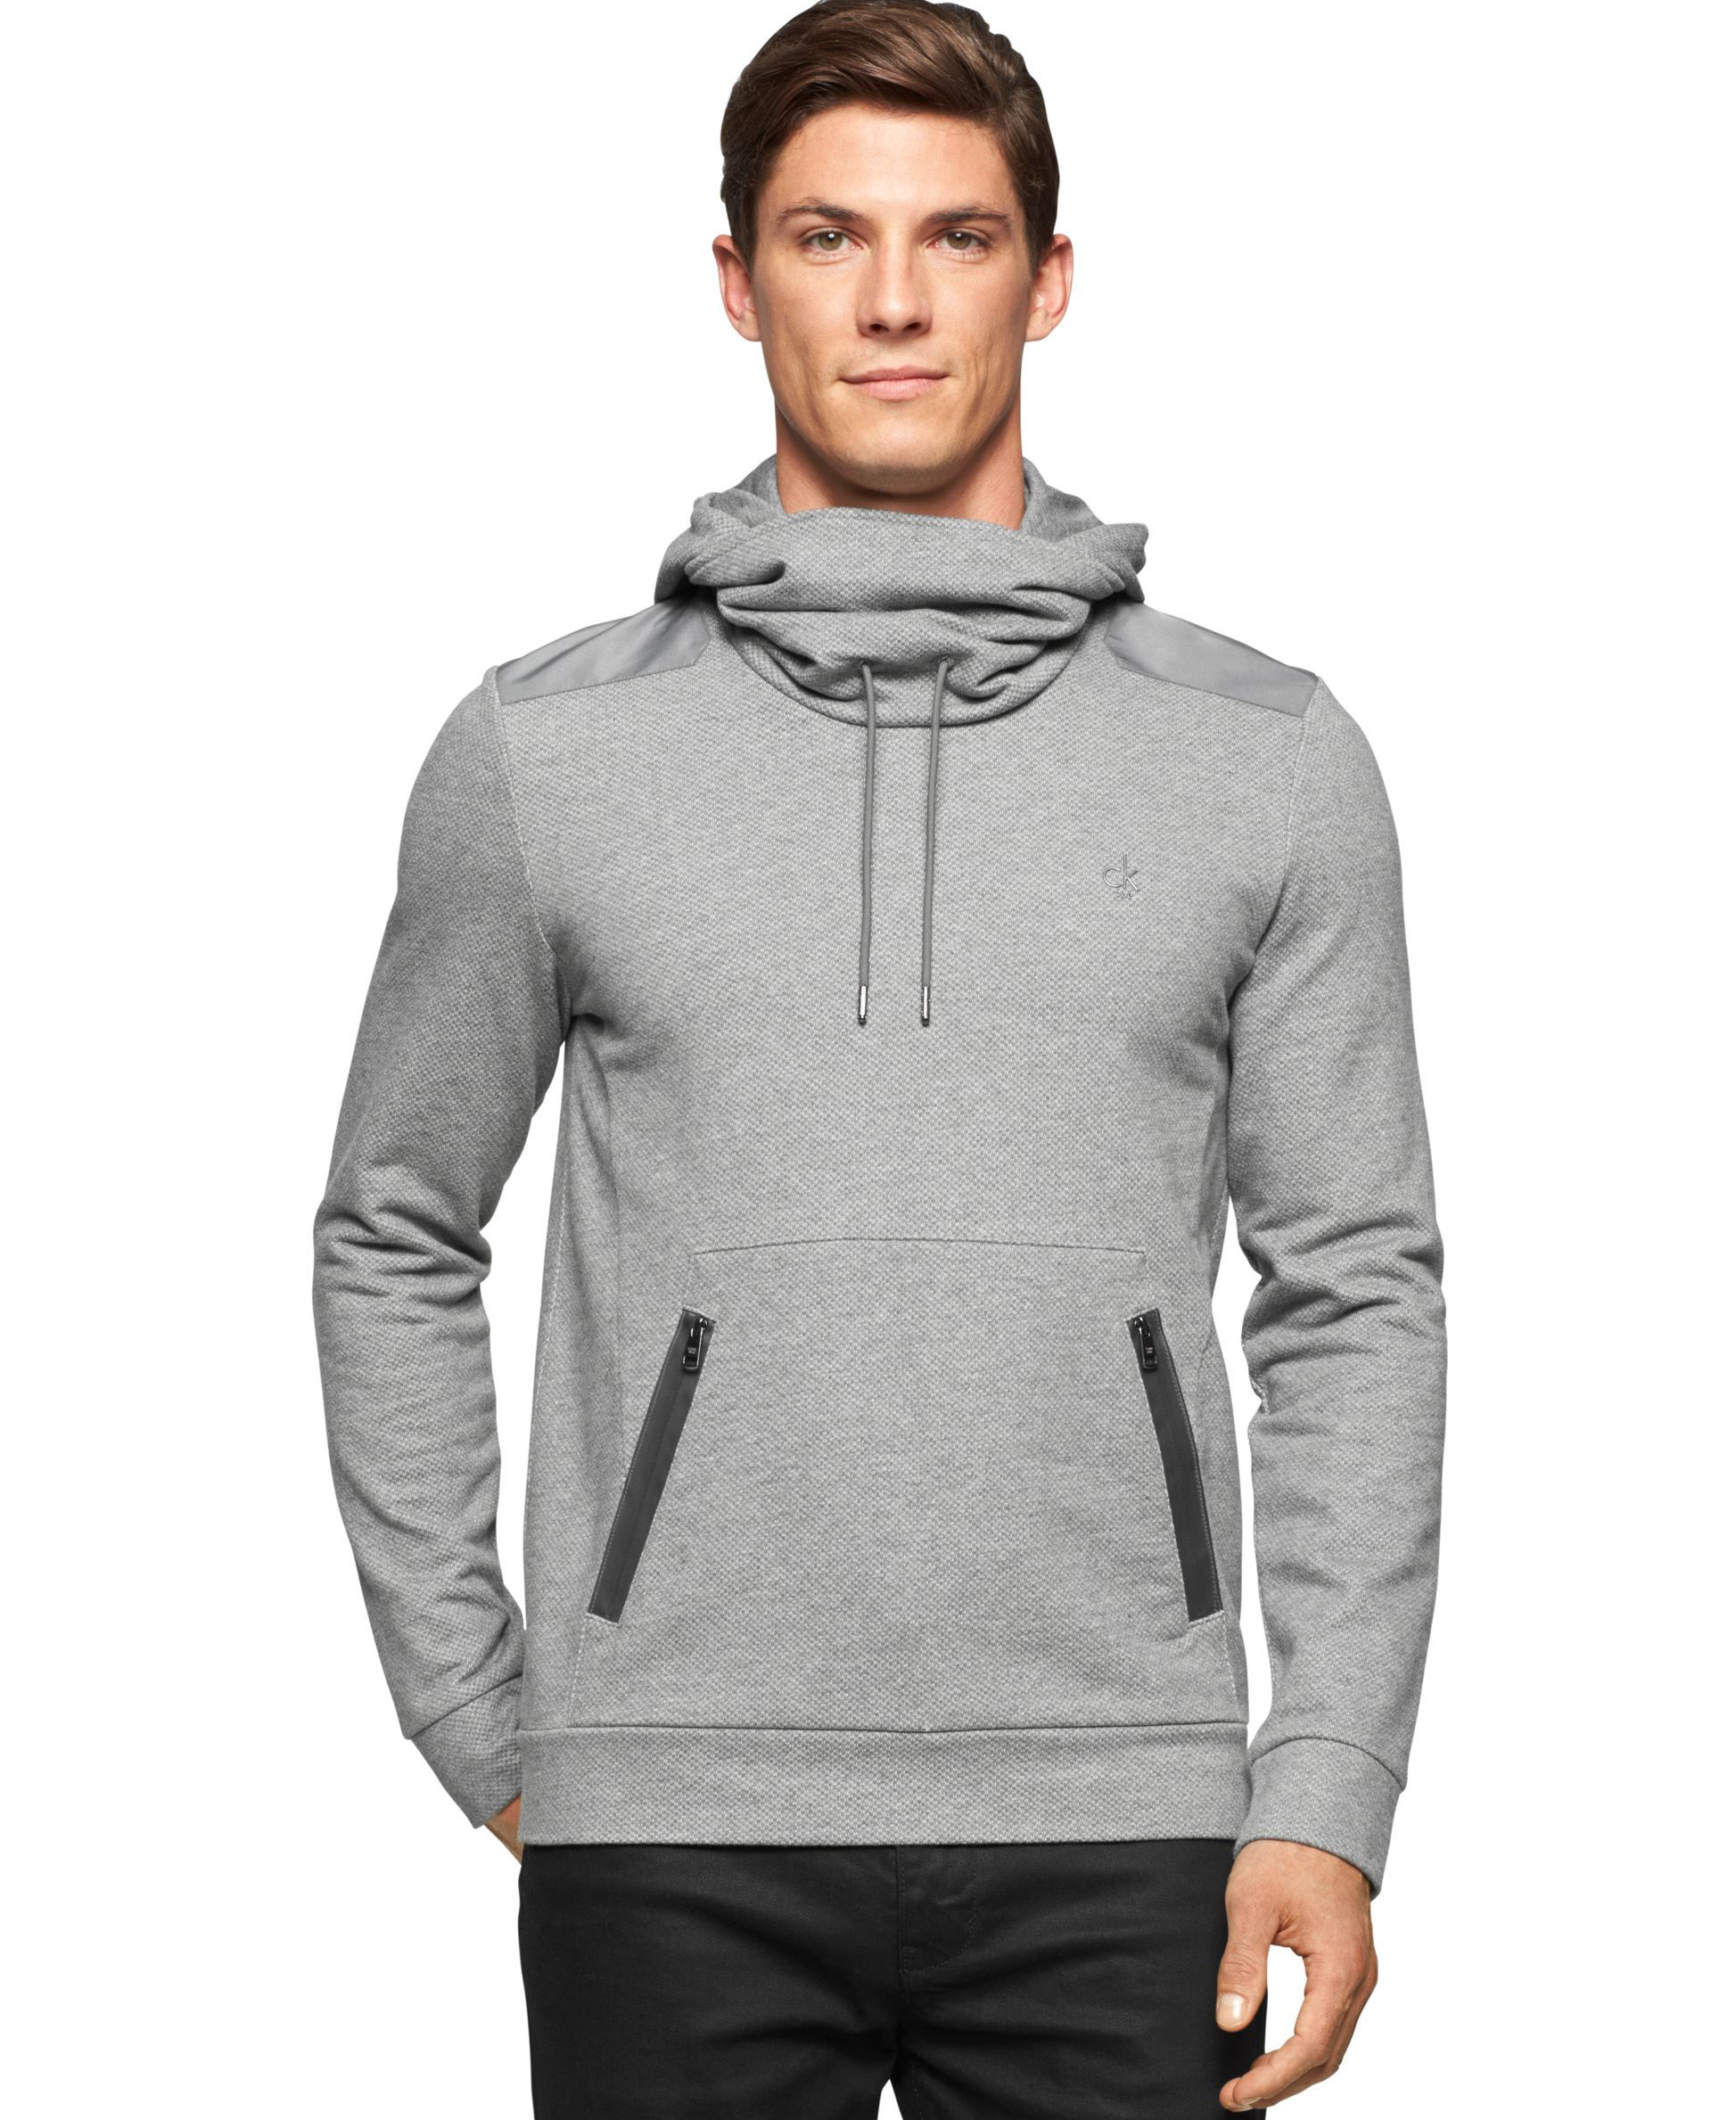 f94df2289bbc Calvin Klein Funnel-Neck Pullover Sweatshirt Men s Hoodies